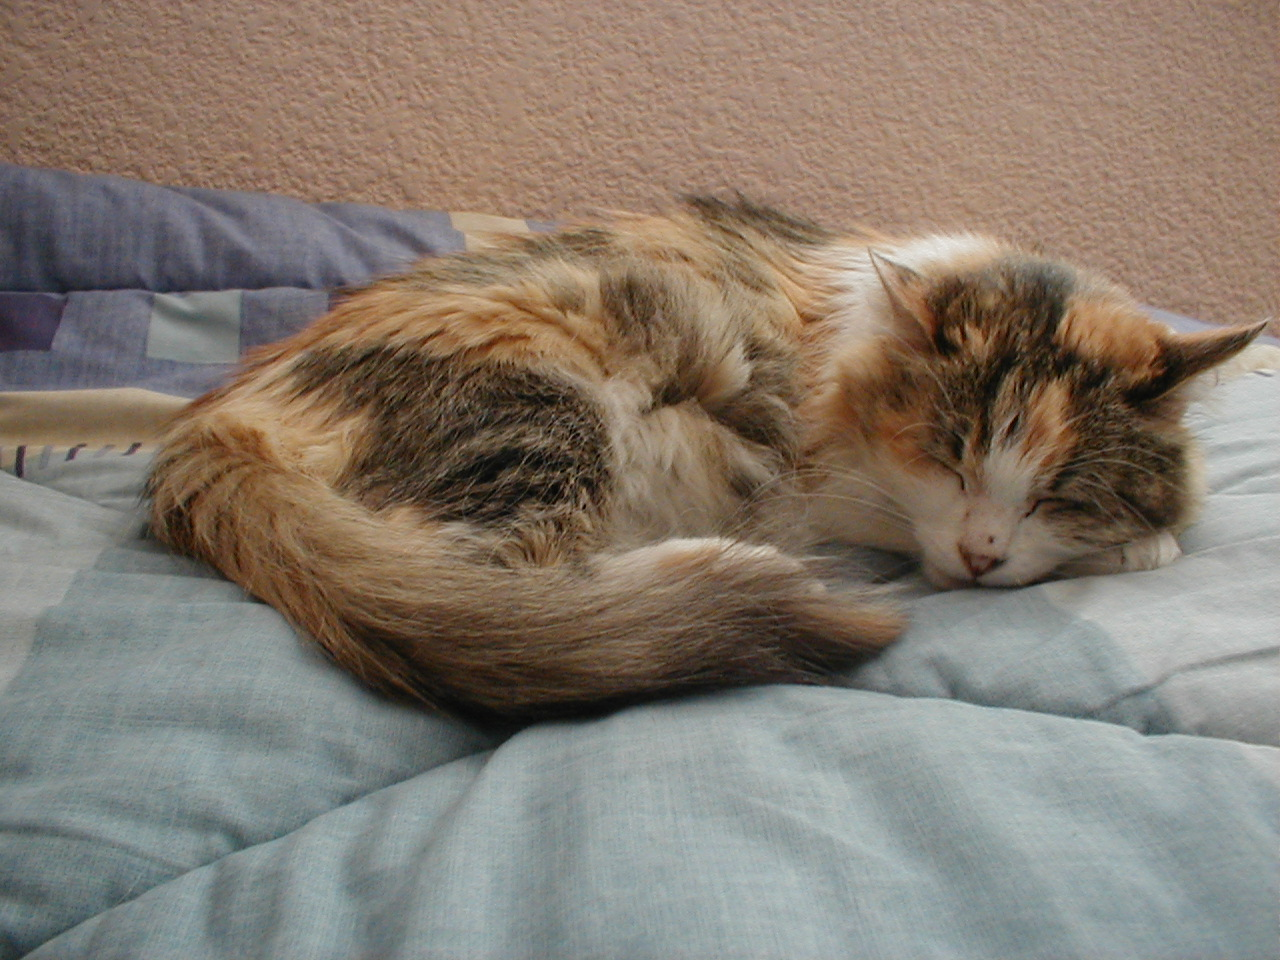 dario sleeping cat on bed nature animals land dreaming sleep